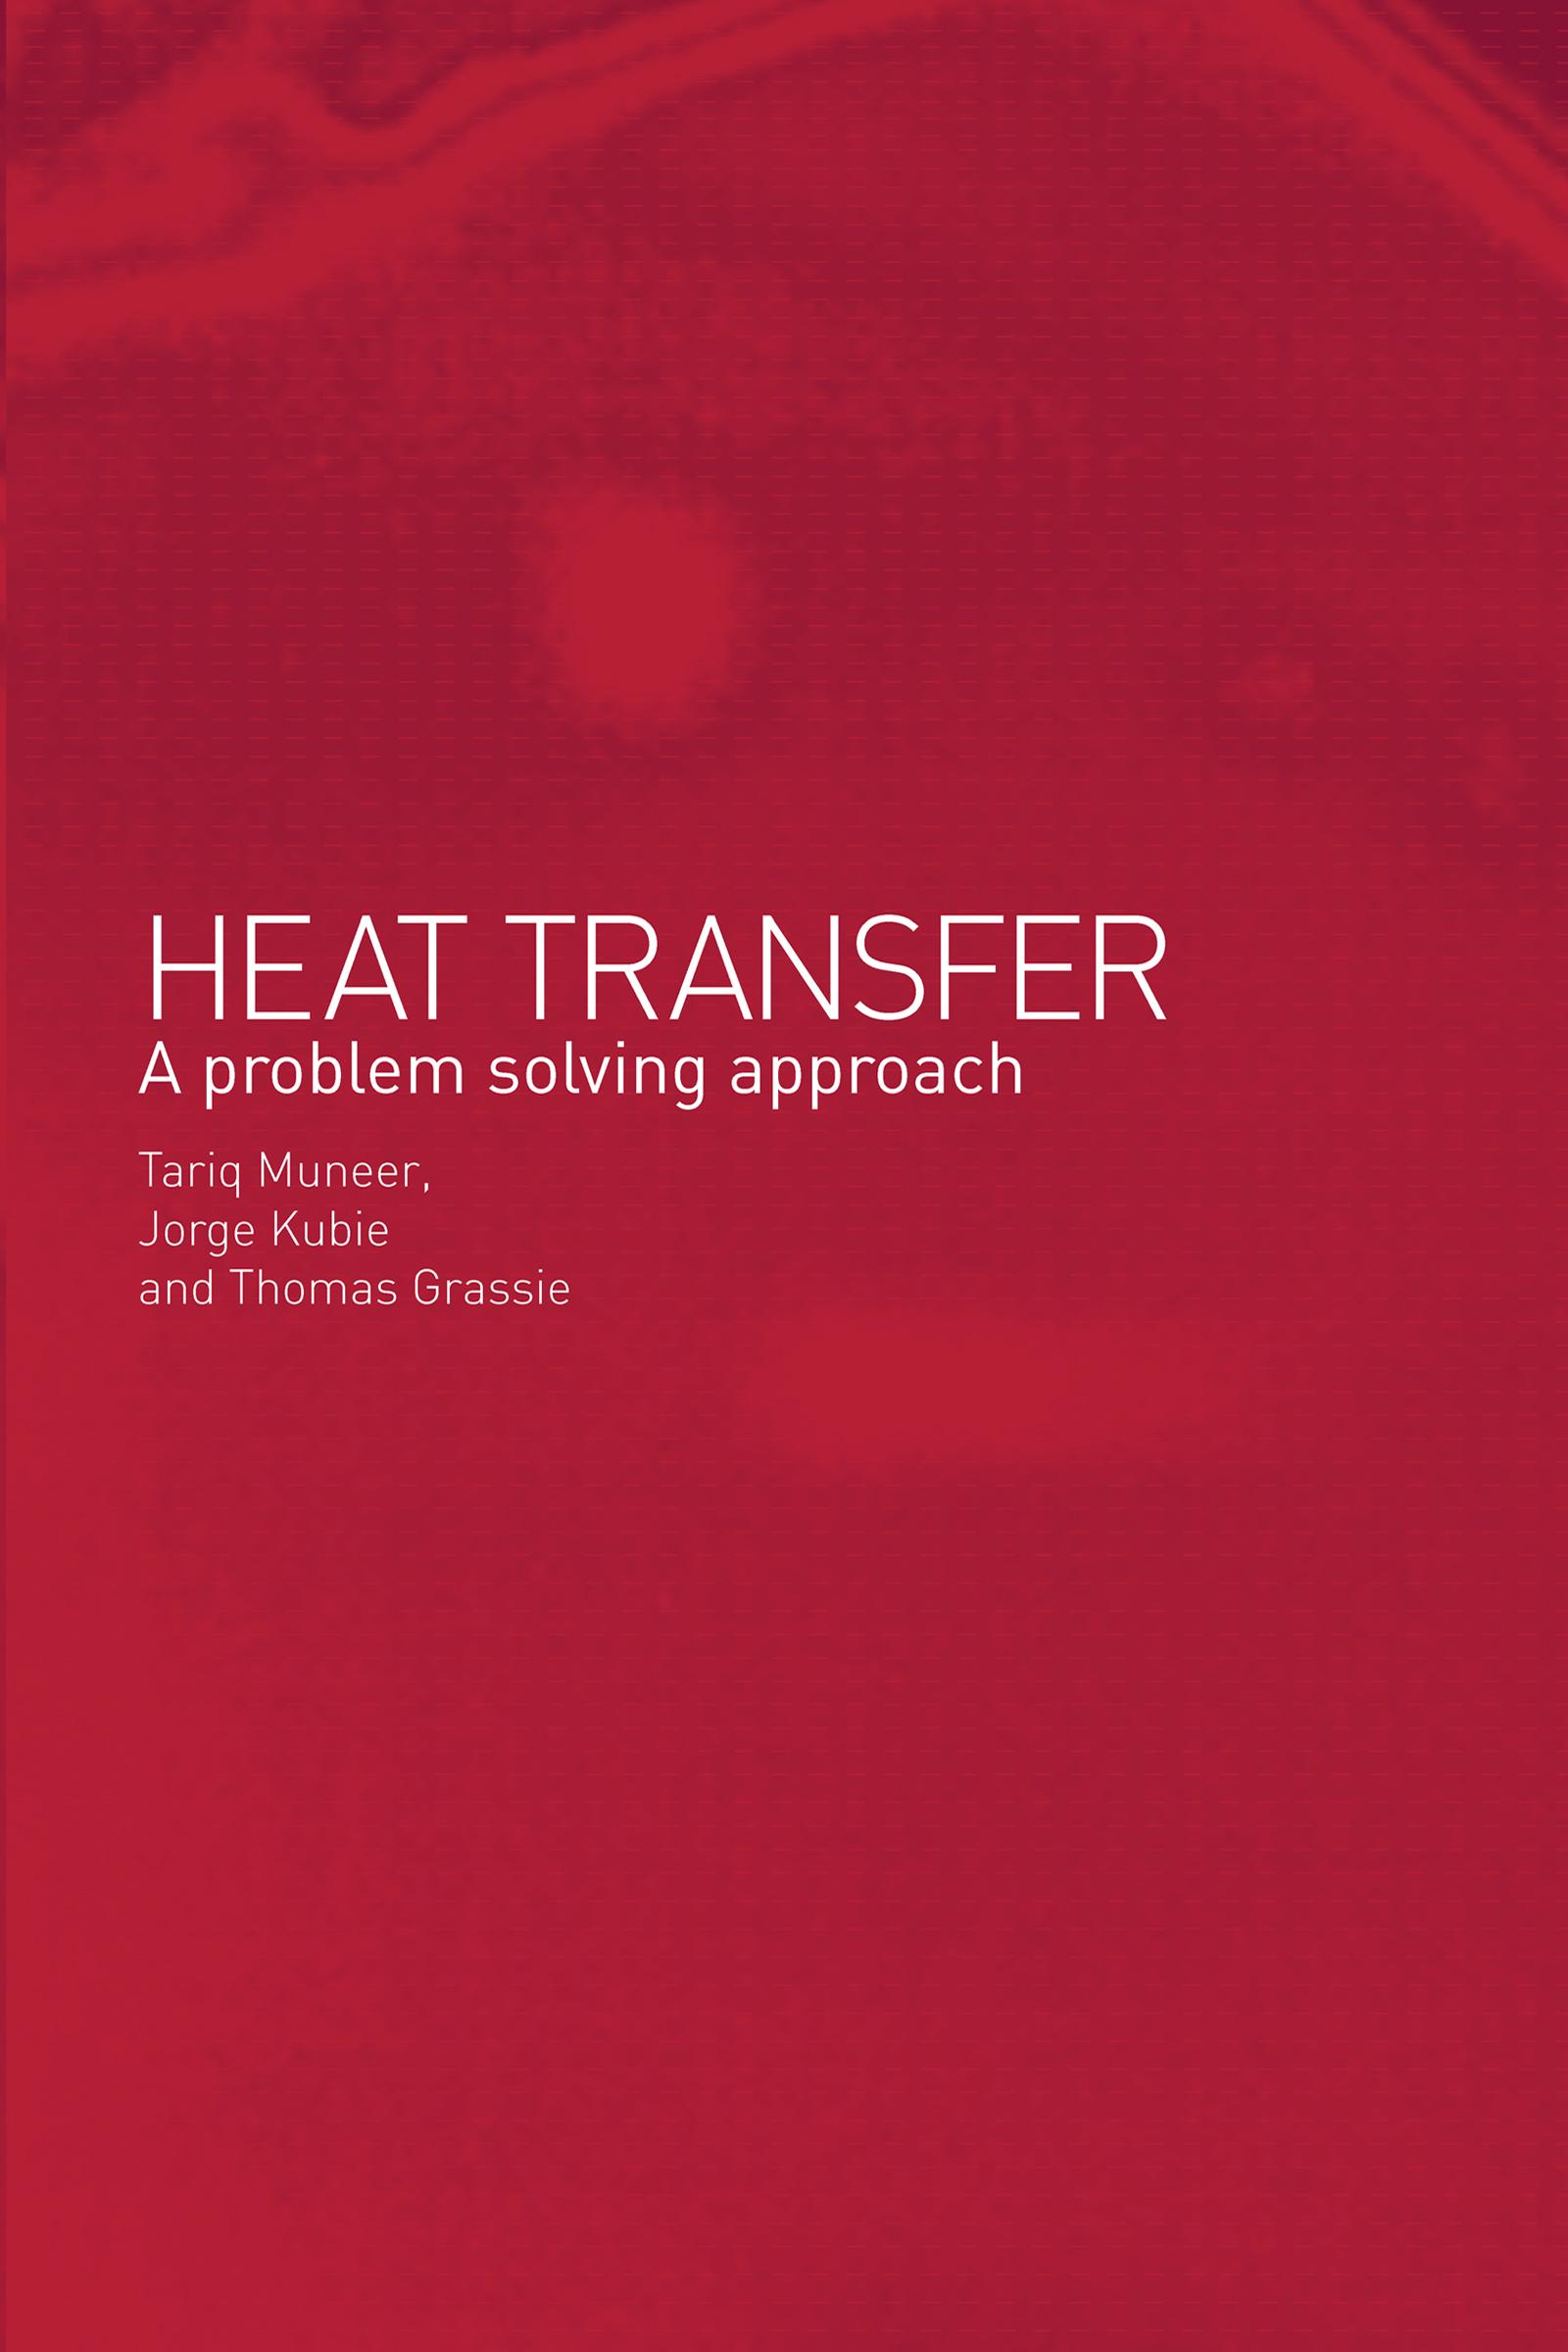 Download Ebook Heat Transfer by Kubie Jorge Pdf